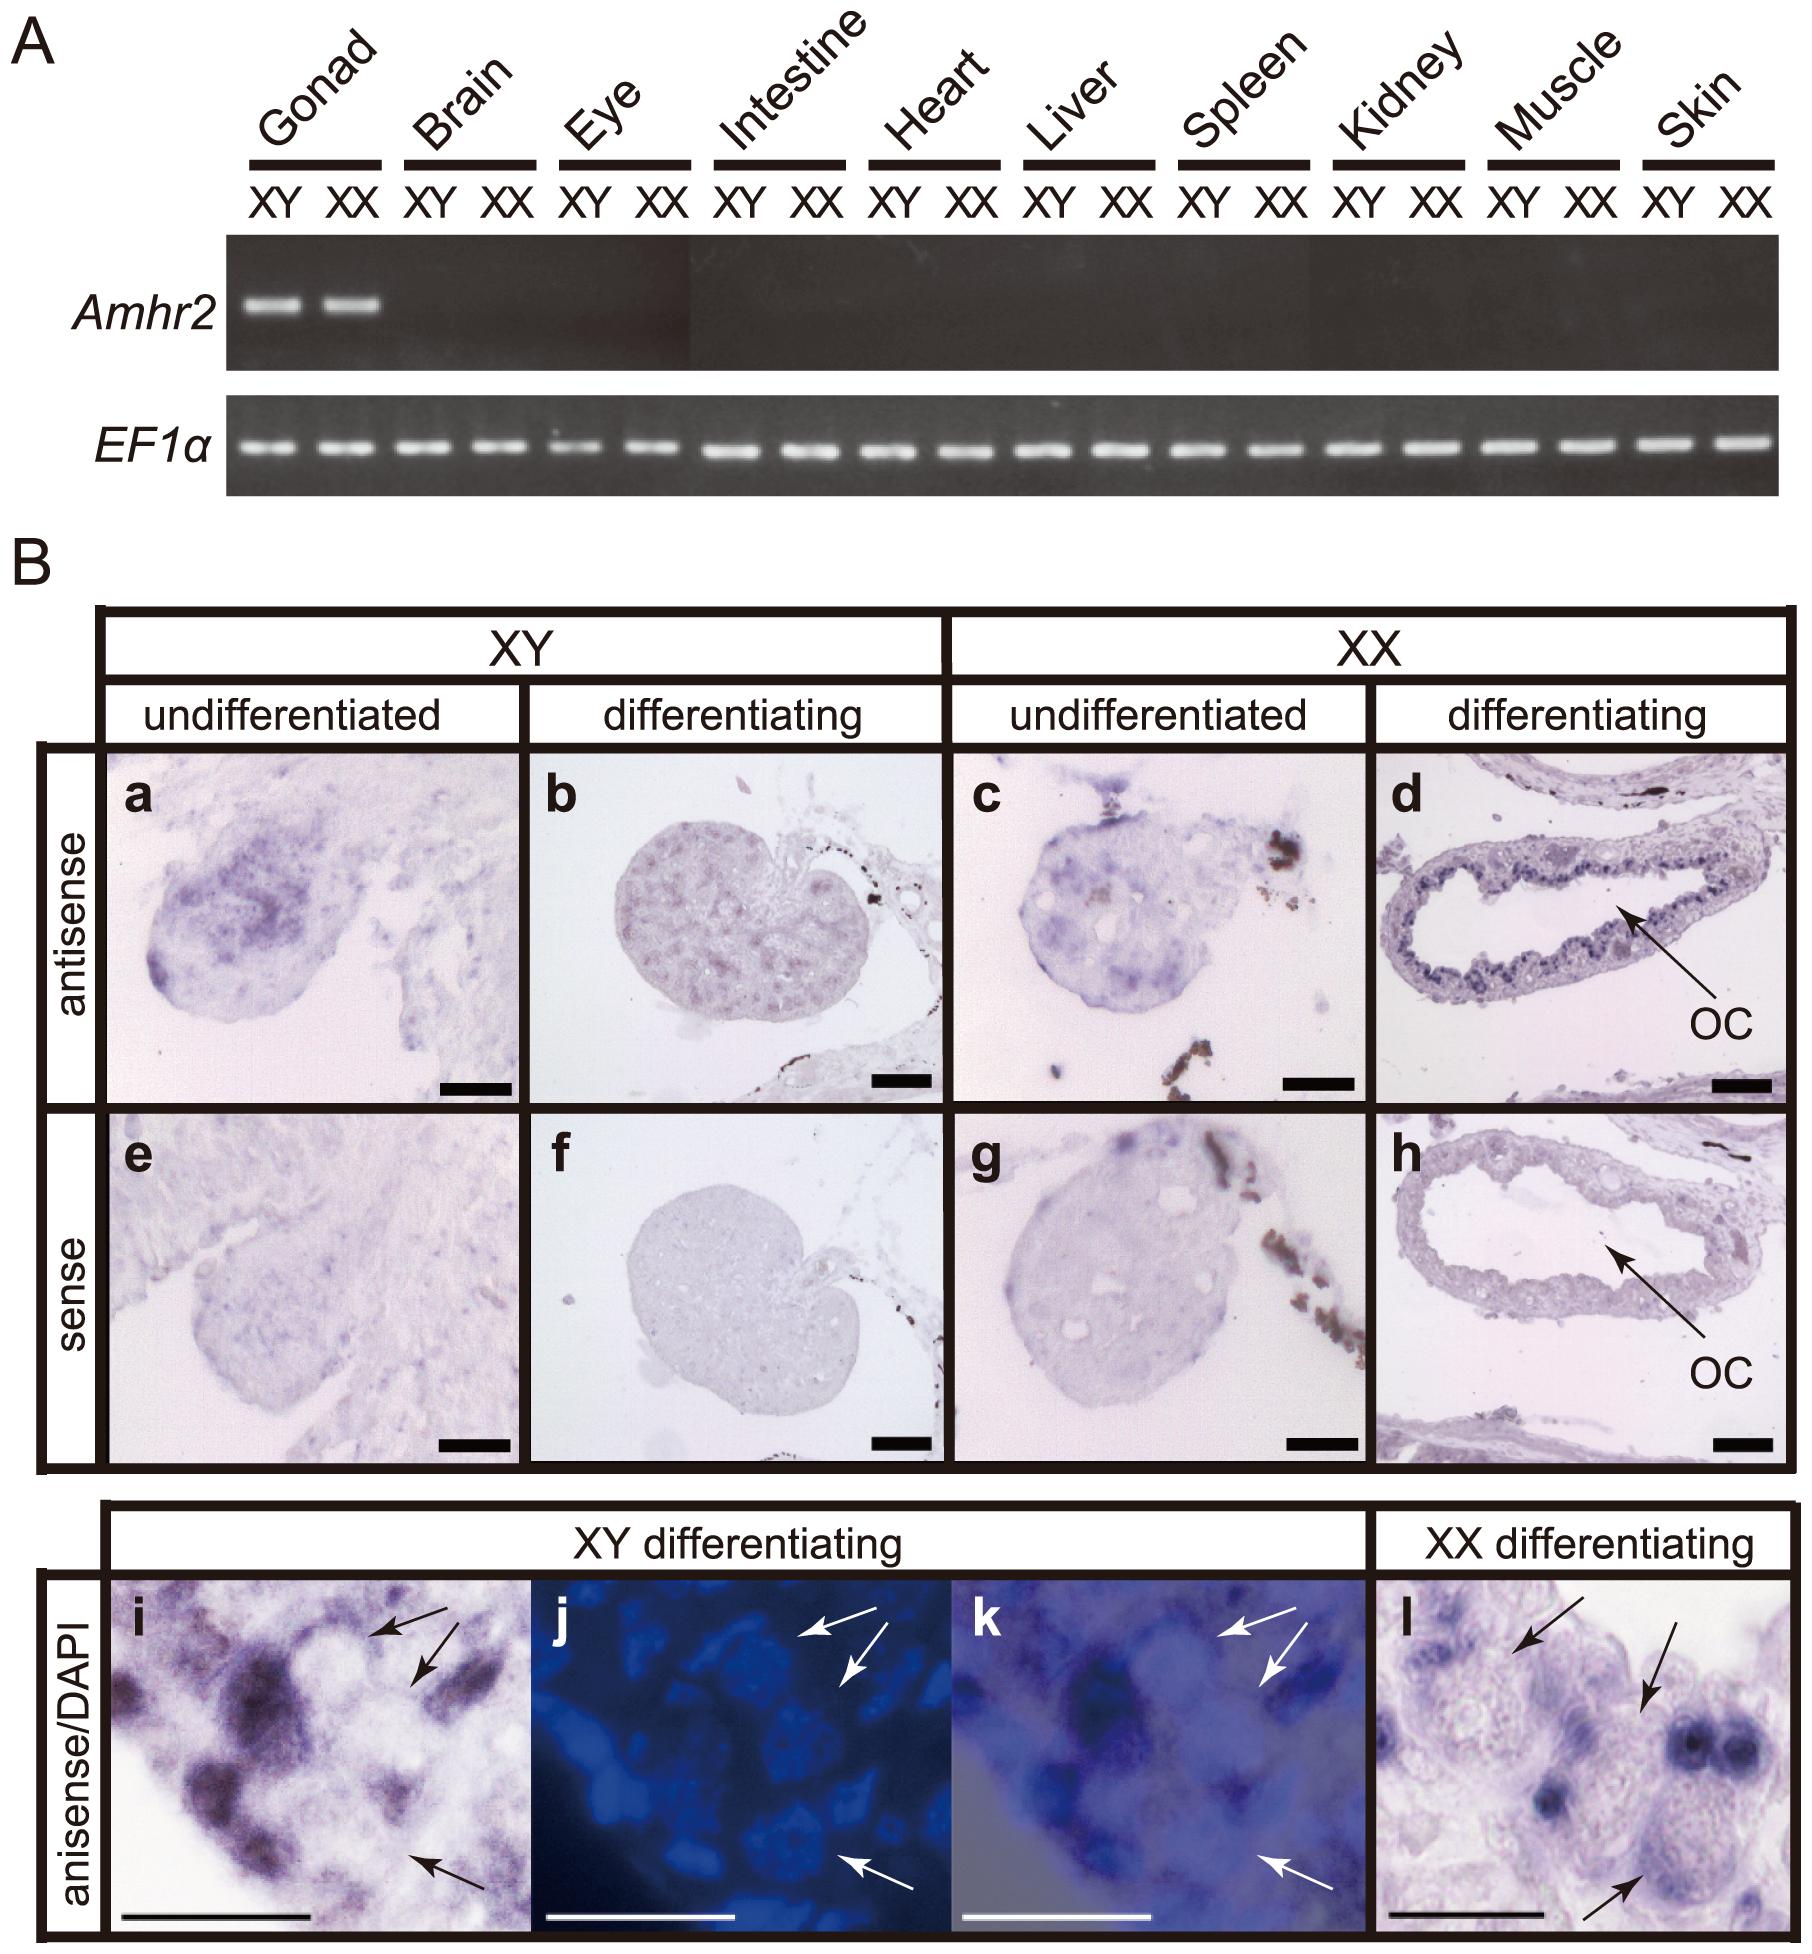 Expression pattern of <i>Amhr2</i> in fugu.